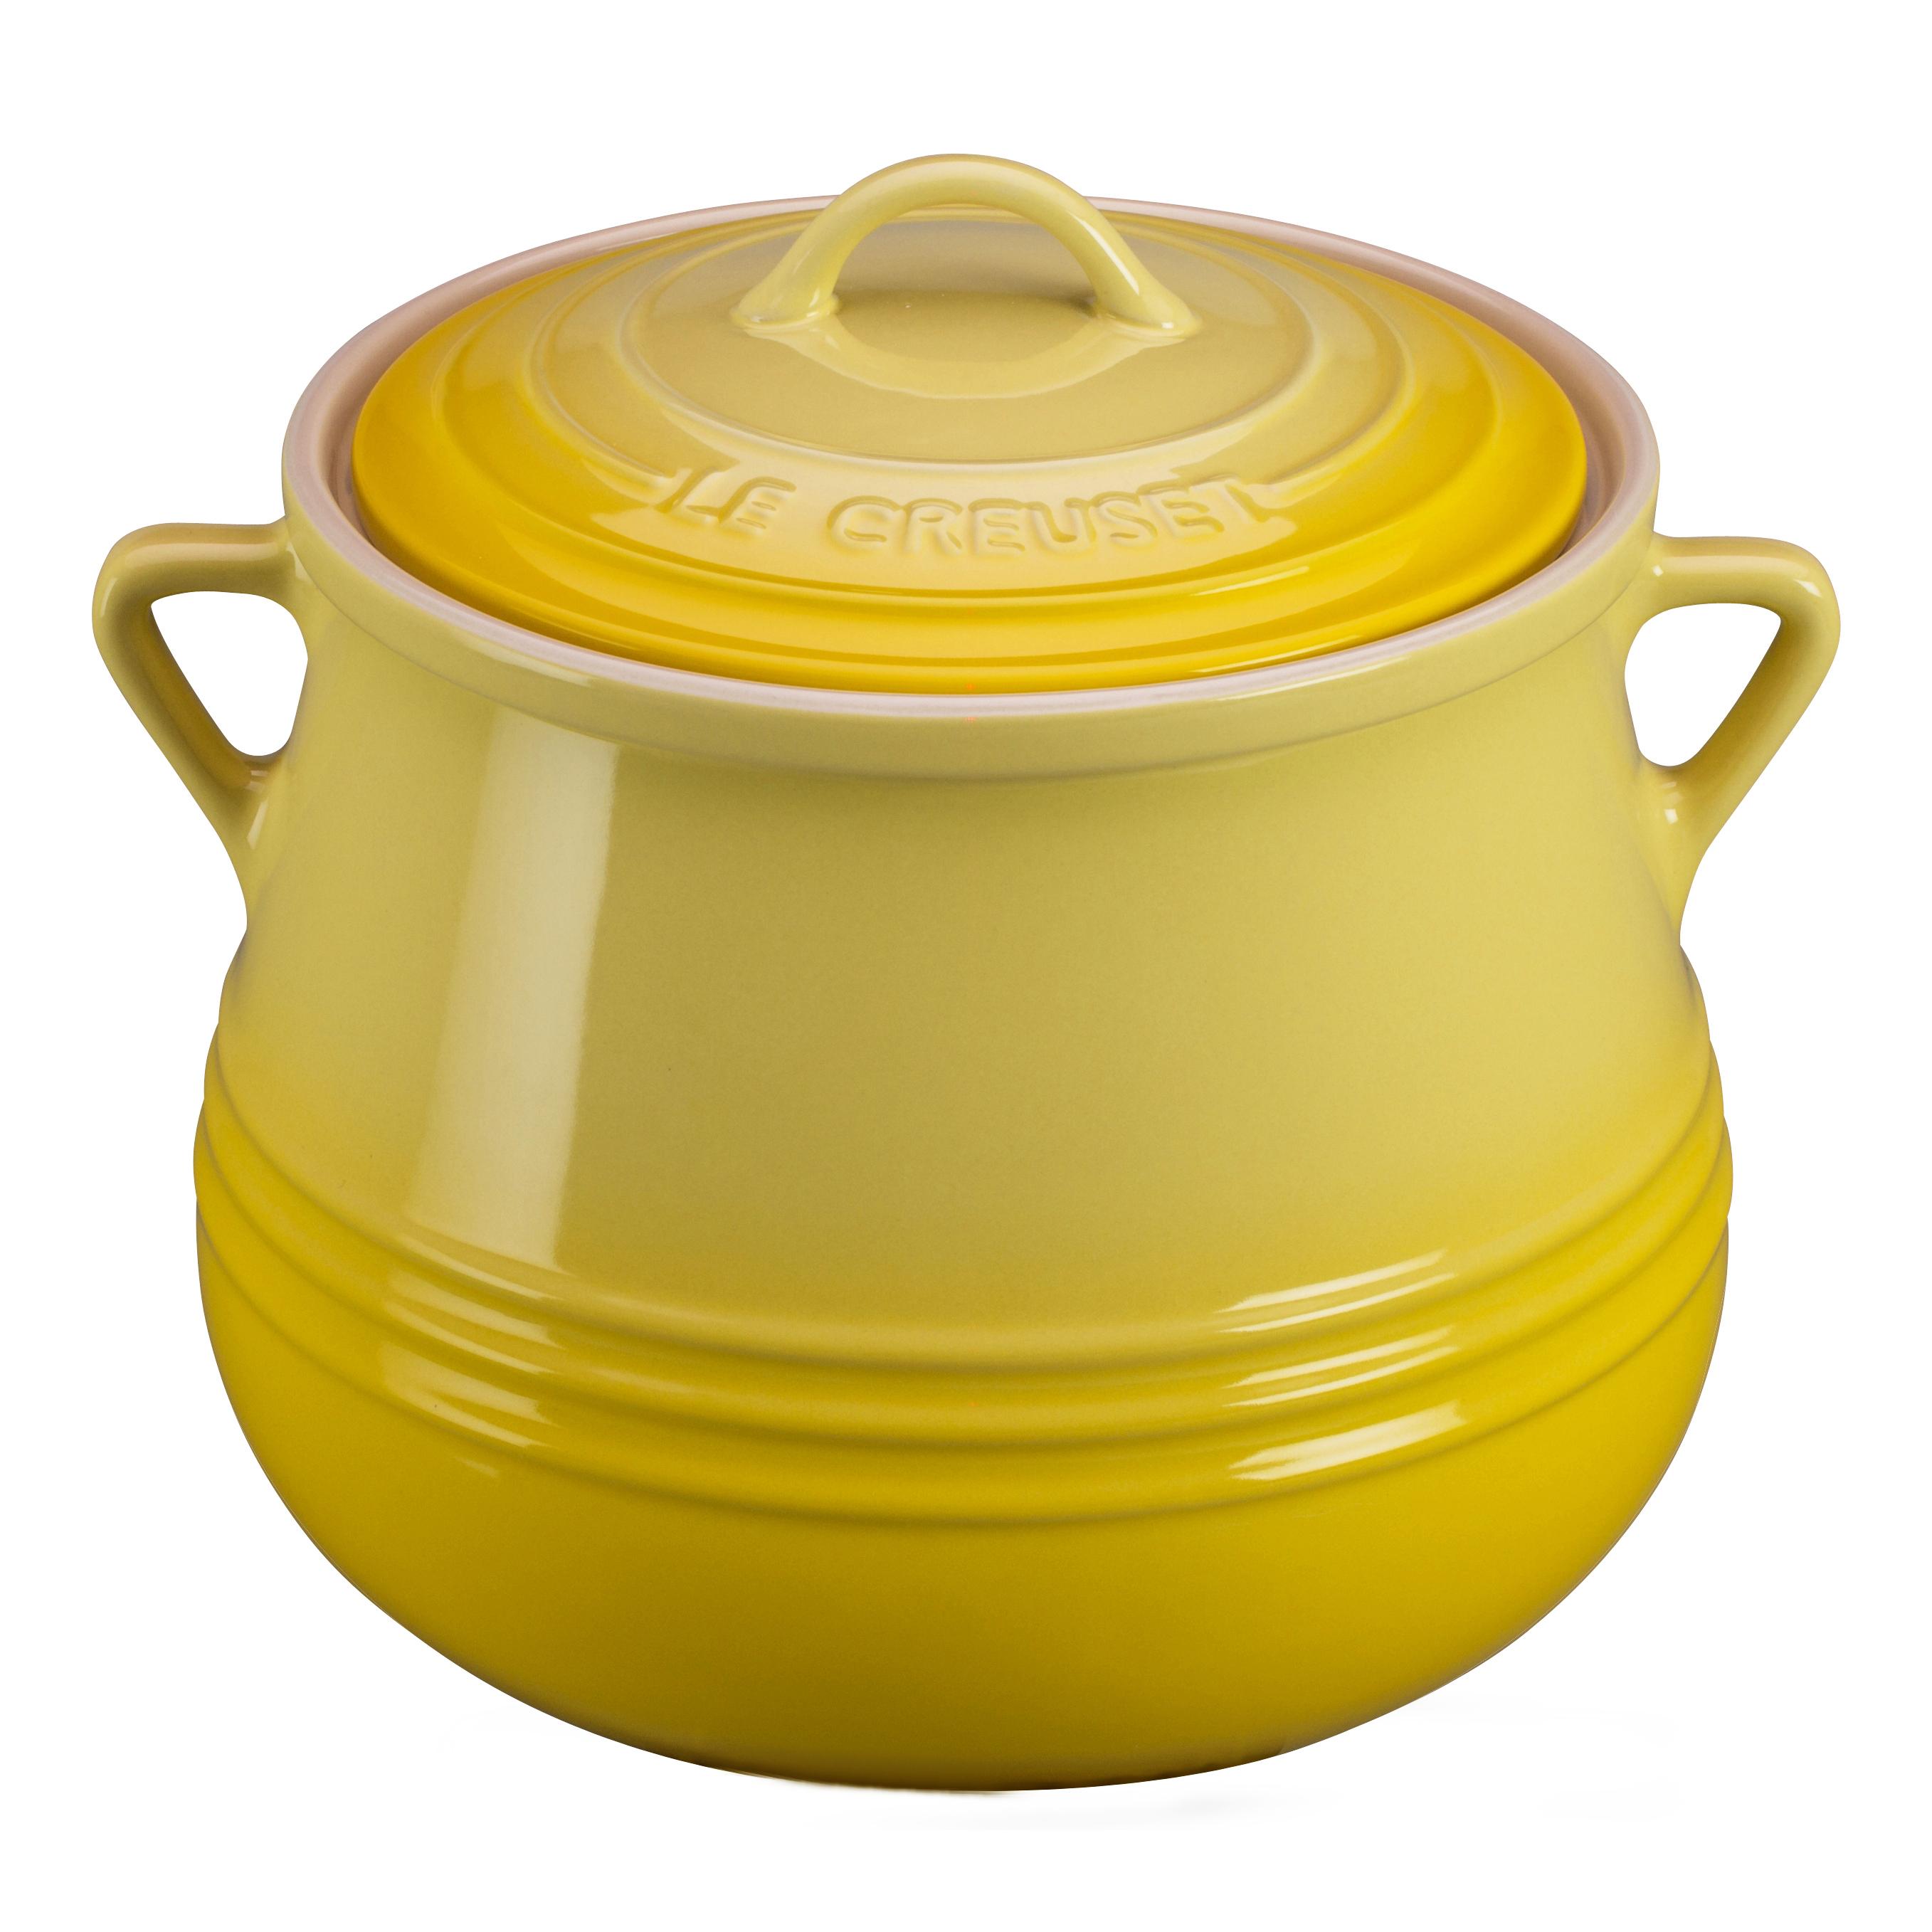 Le Creuset Heritage Soleil Yellow Stoneware Bean Pot, 4.5 Quart